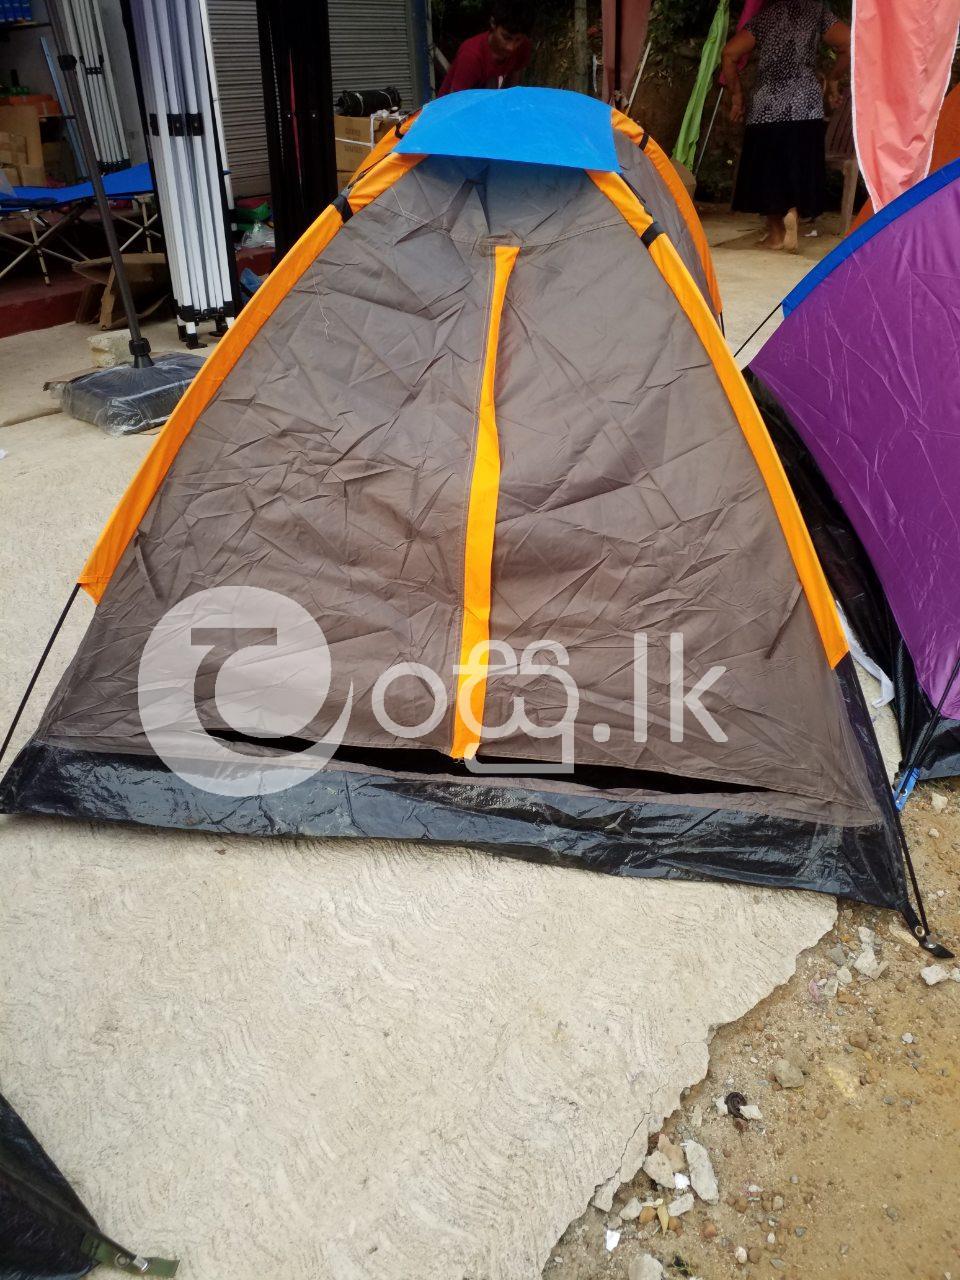 Camping Tent Sports Equipment in Padukka